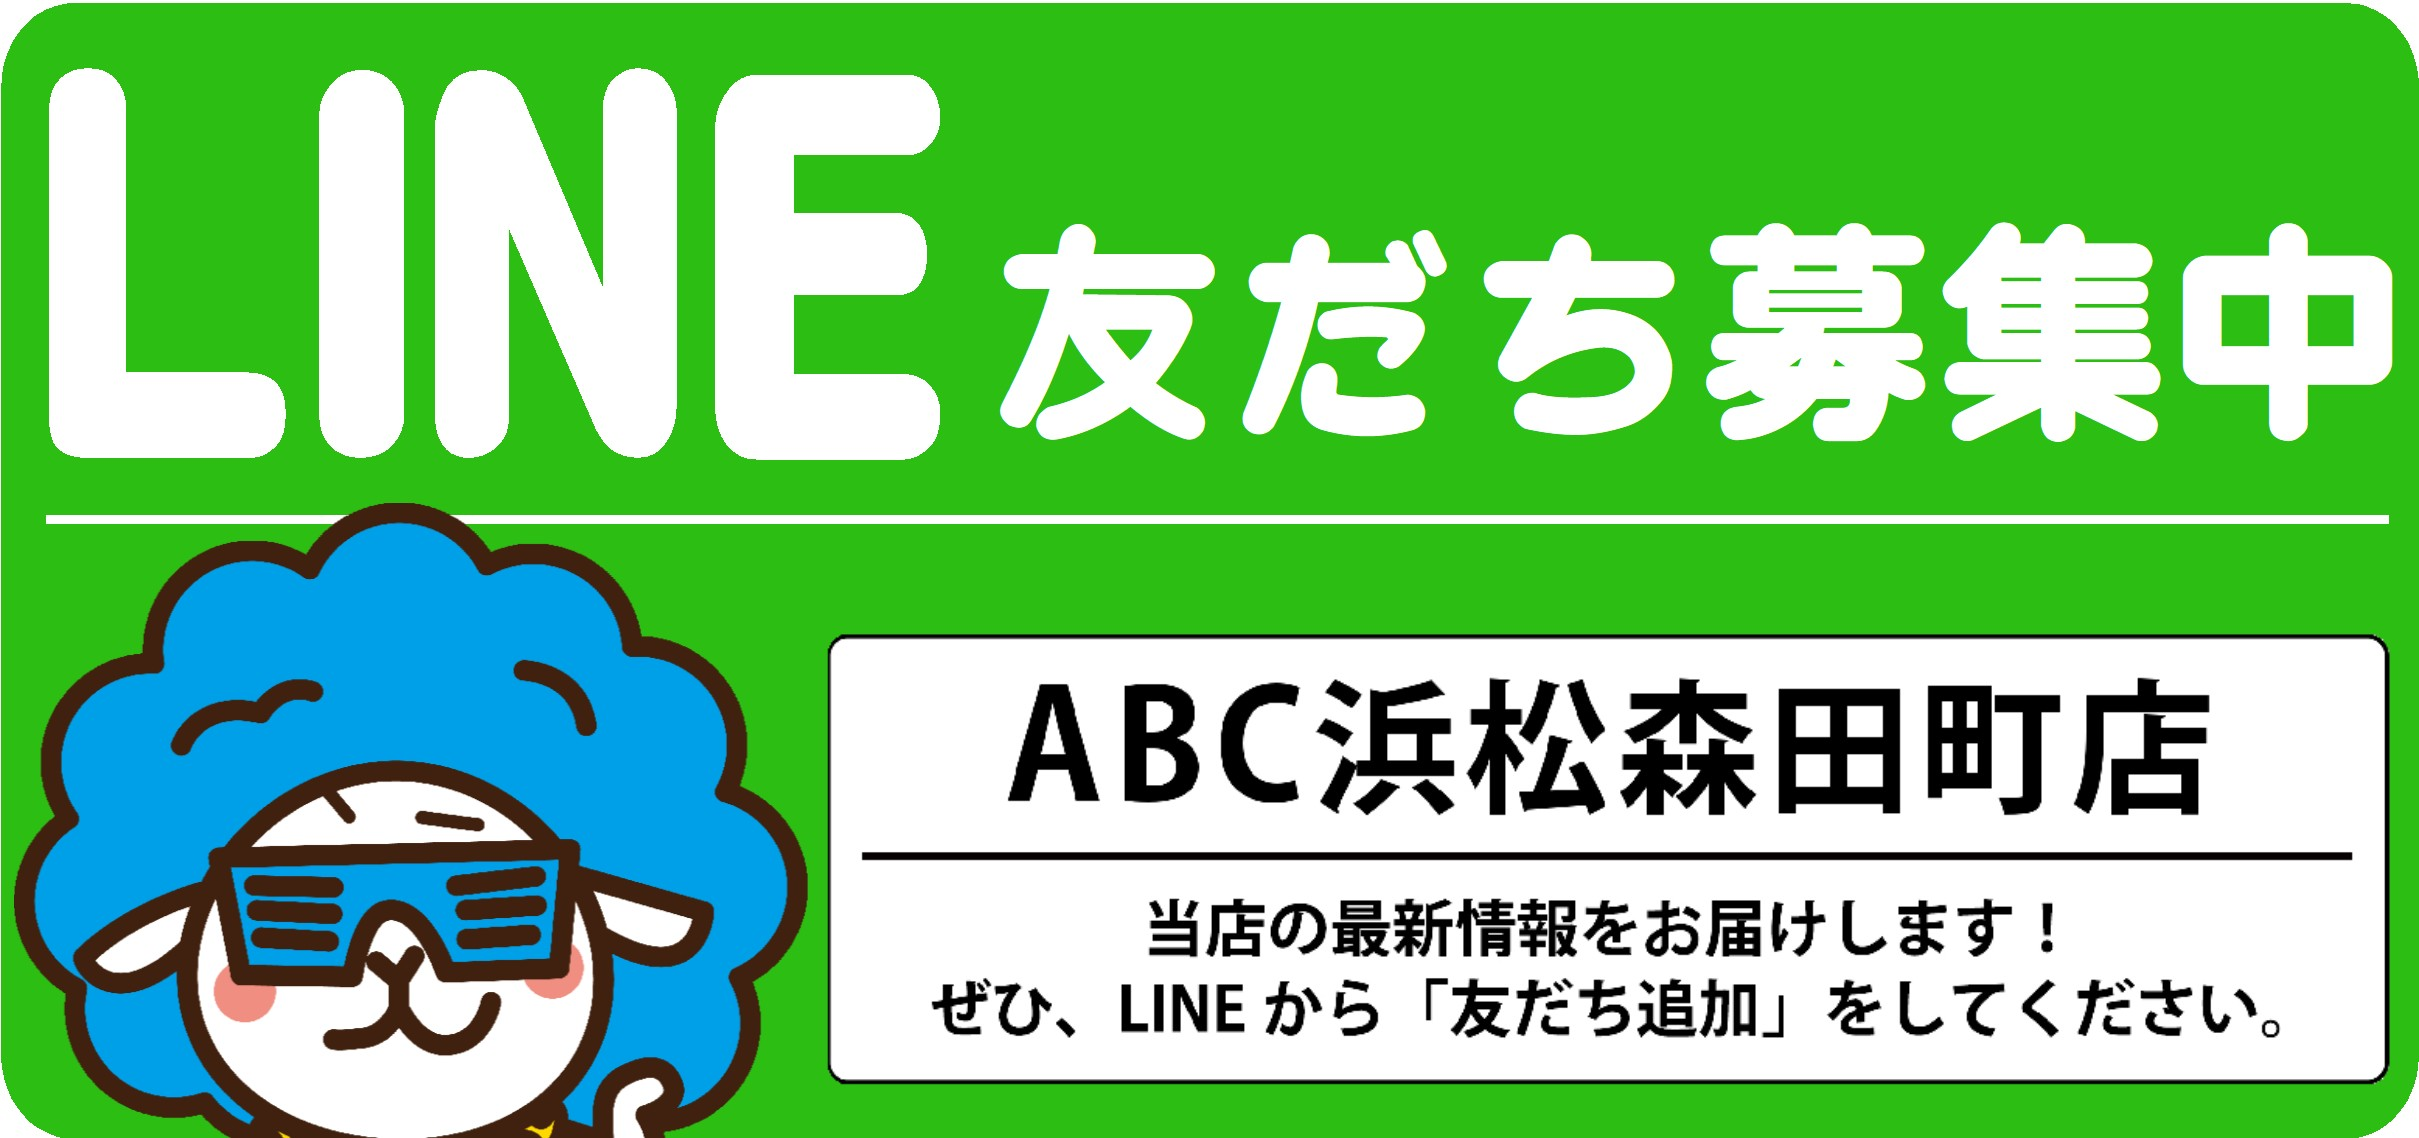 LINE@友達募集!